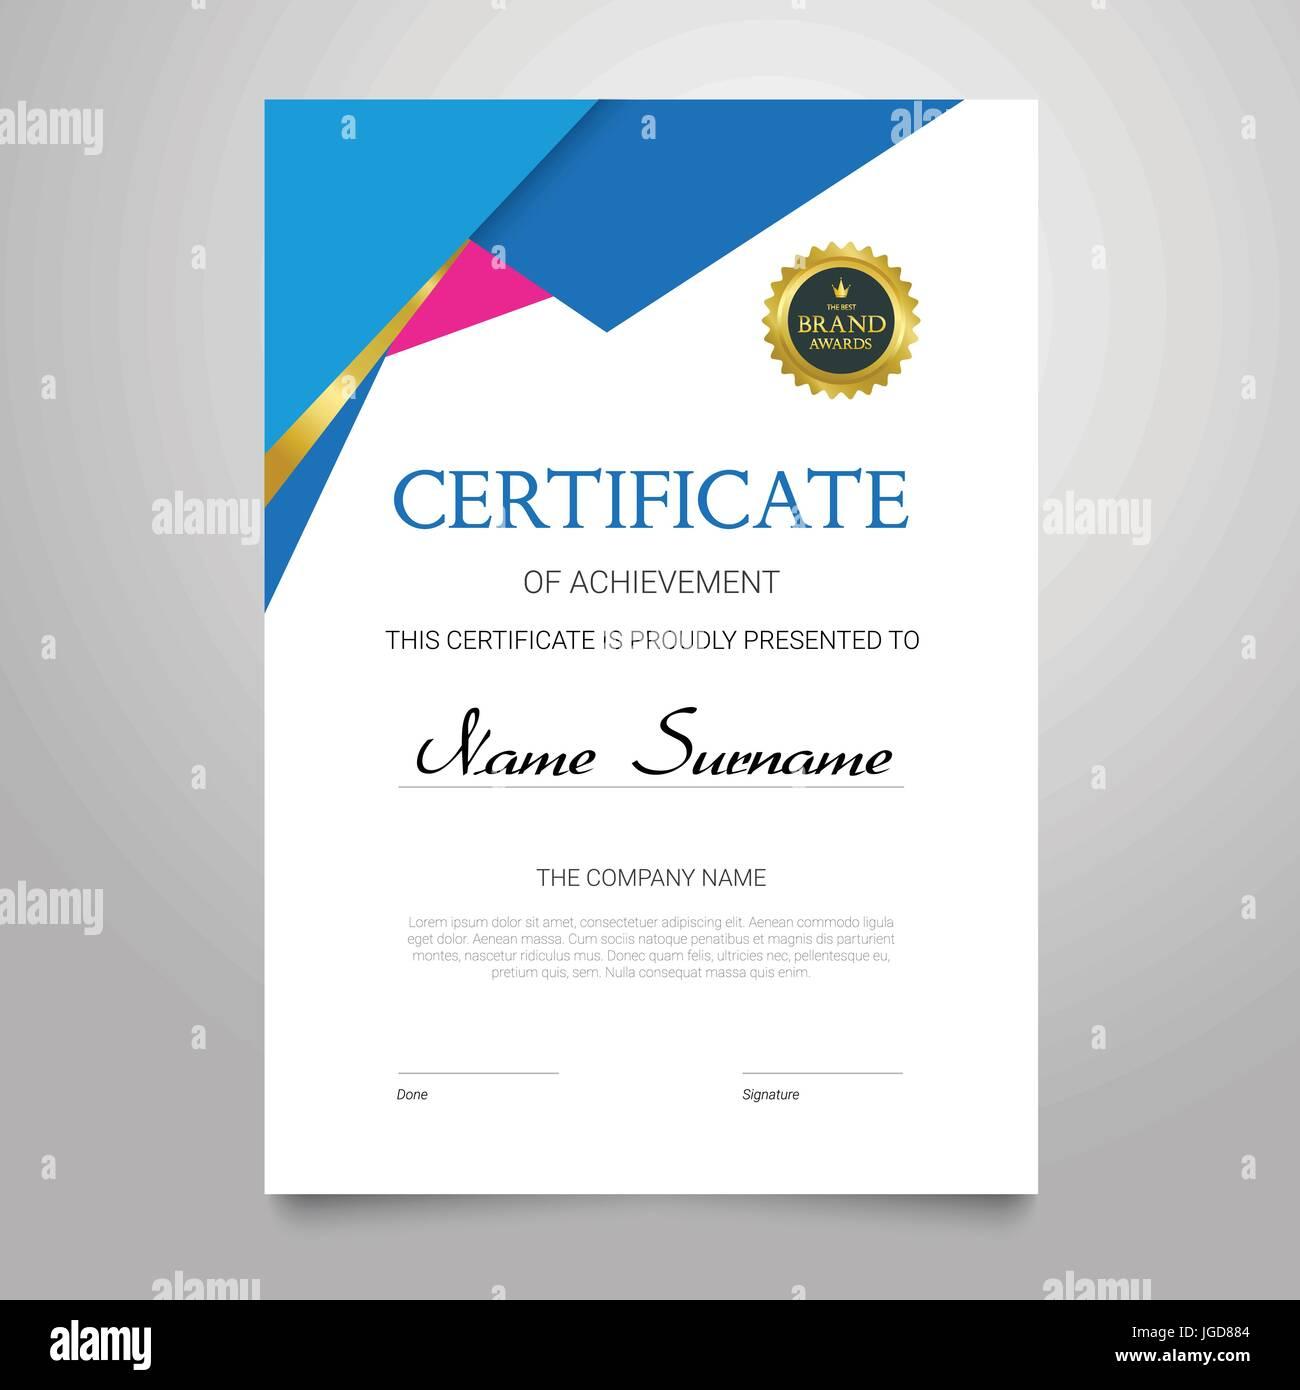 Zertifikat - moderne vertikale elegante Vektor Dokument mit Luxus ...